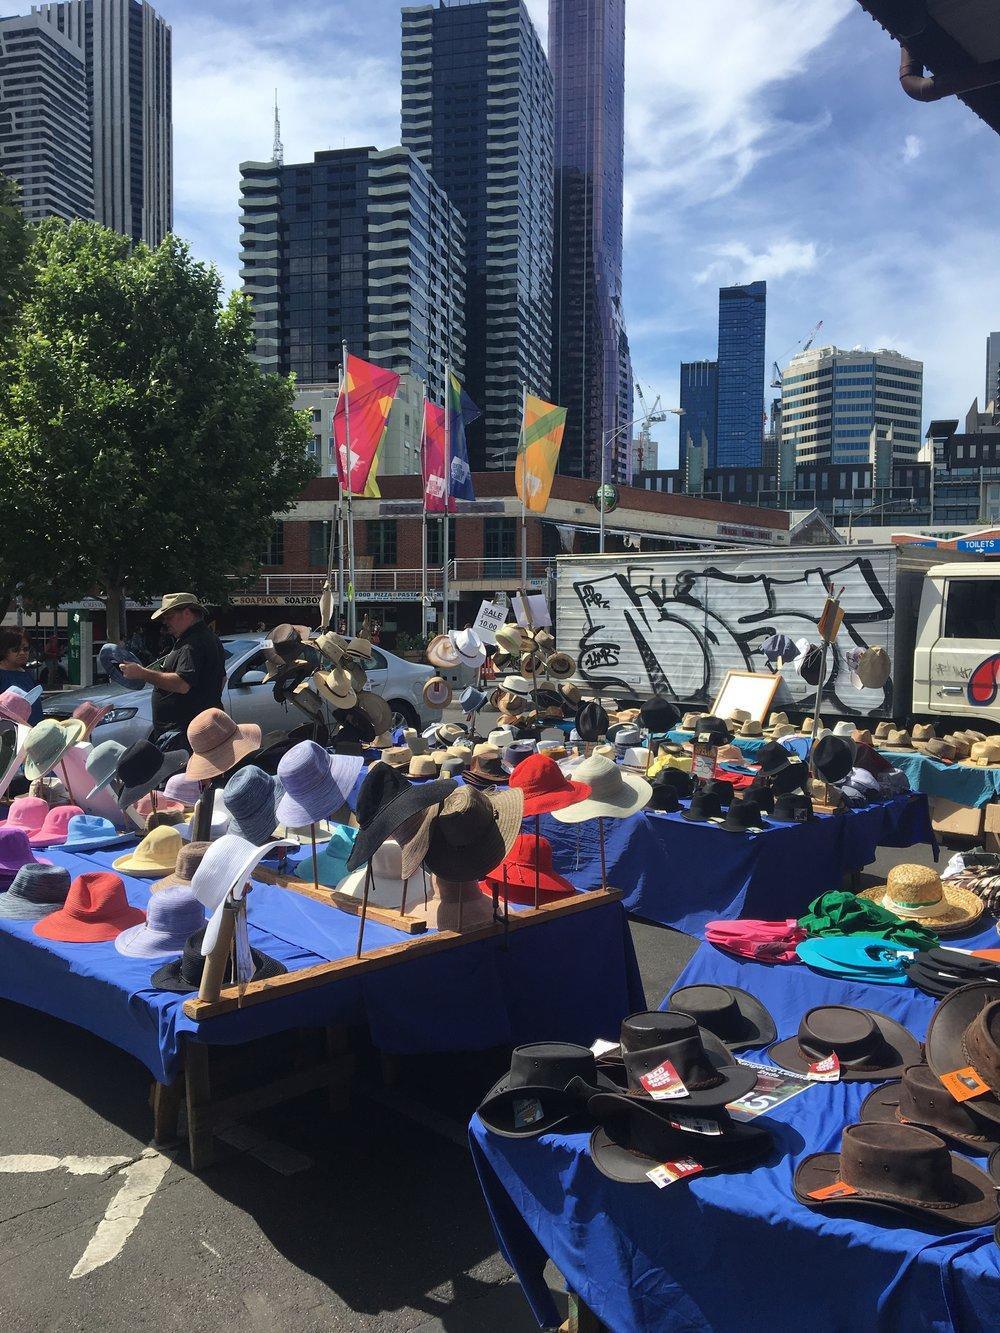 australia-melbourne-city-victoria-market-day-2-3.JPG